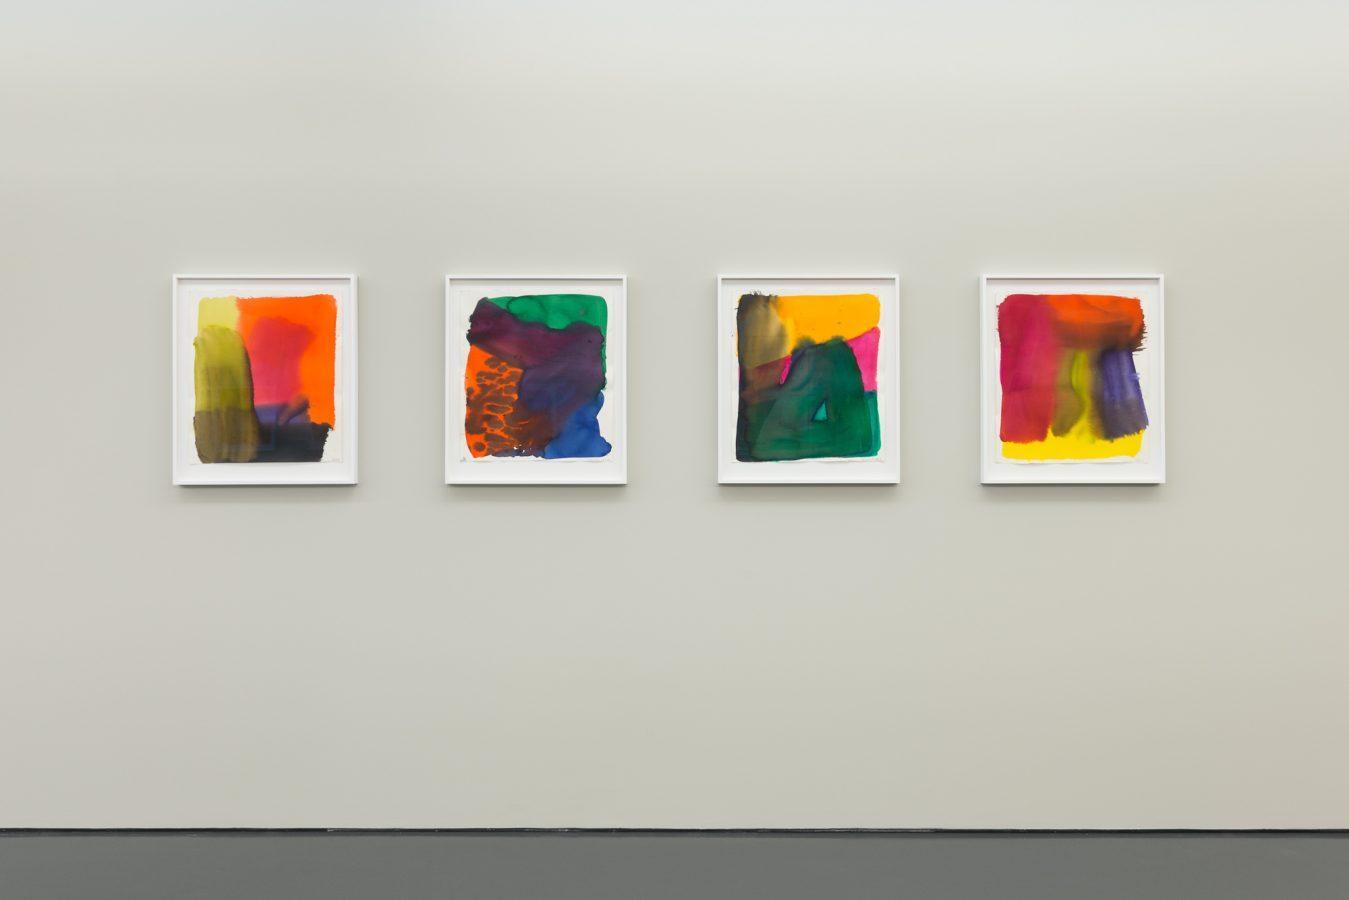 Galeria Pedro Cera – Yves Oppenheim - Quand j'aurai circonscrit ma sphère